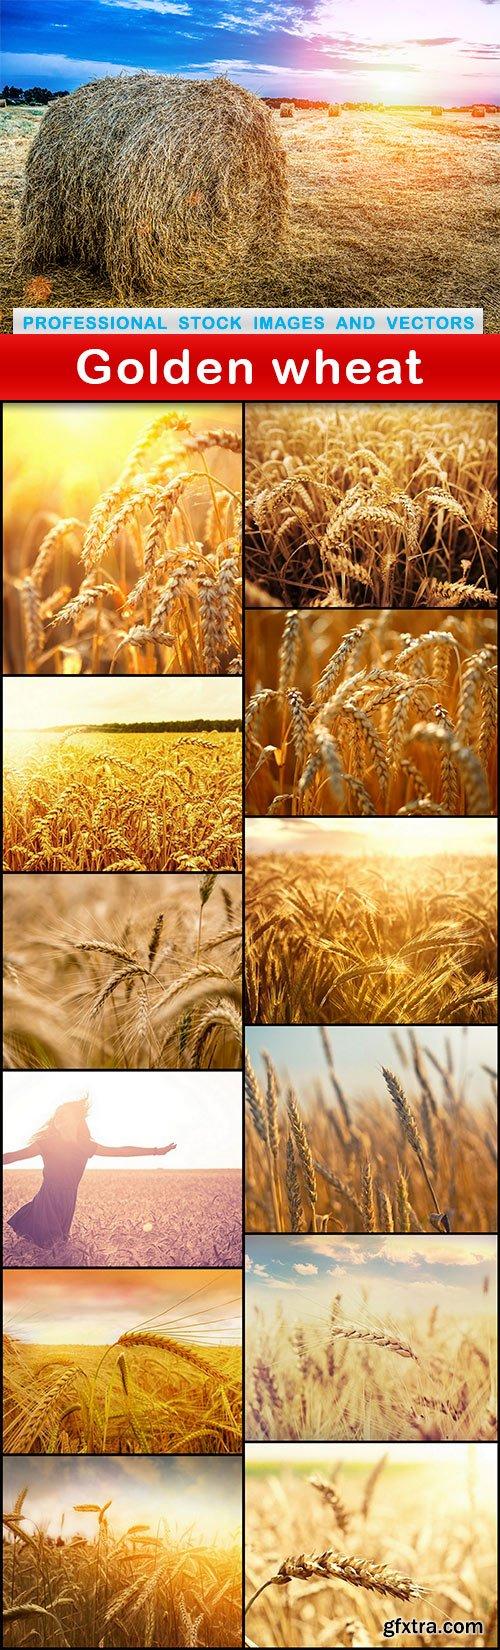 Golden wheat - 13 UHQ JPEG